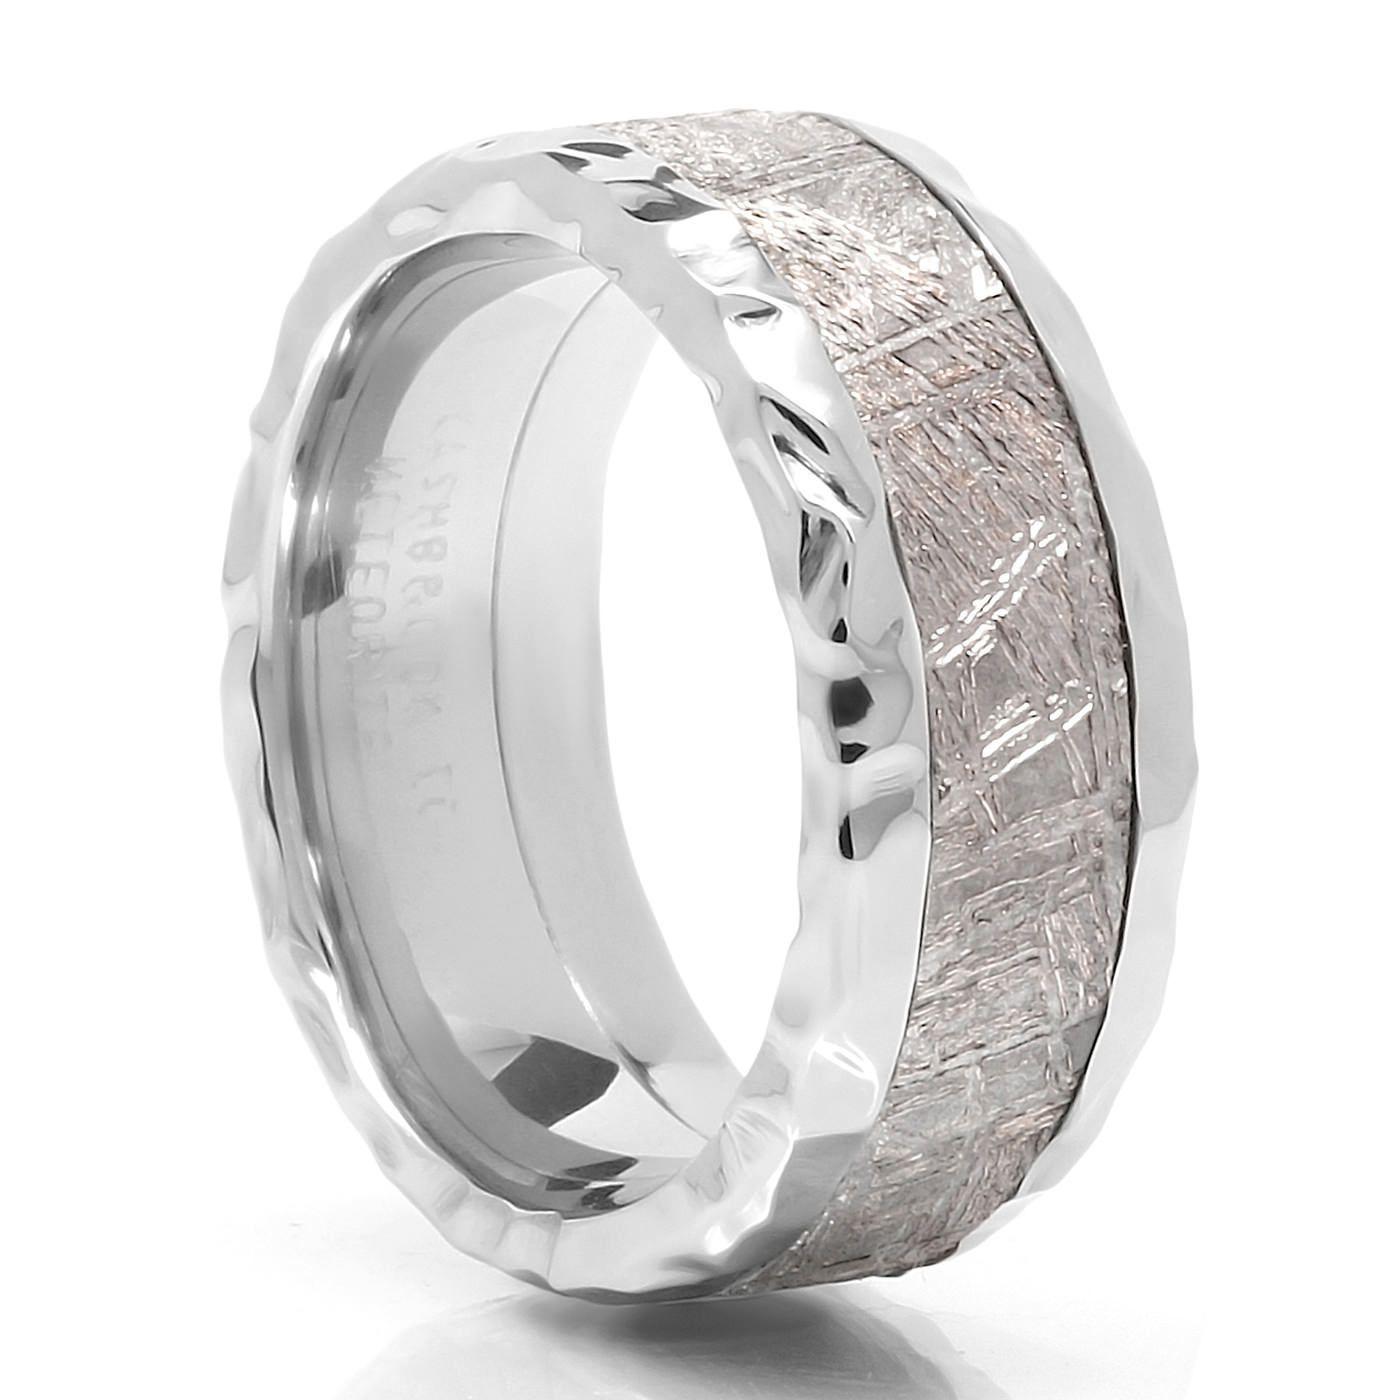 CRATER Cobalt & Meteorite Meteorite wedding band, Modern